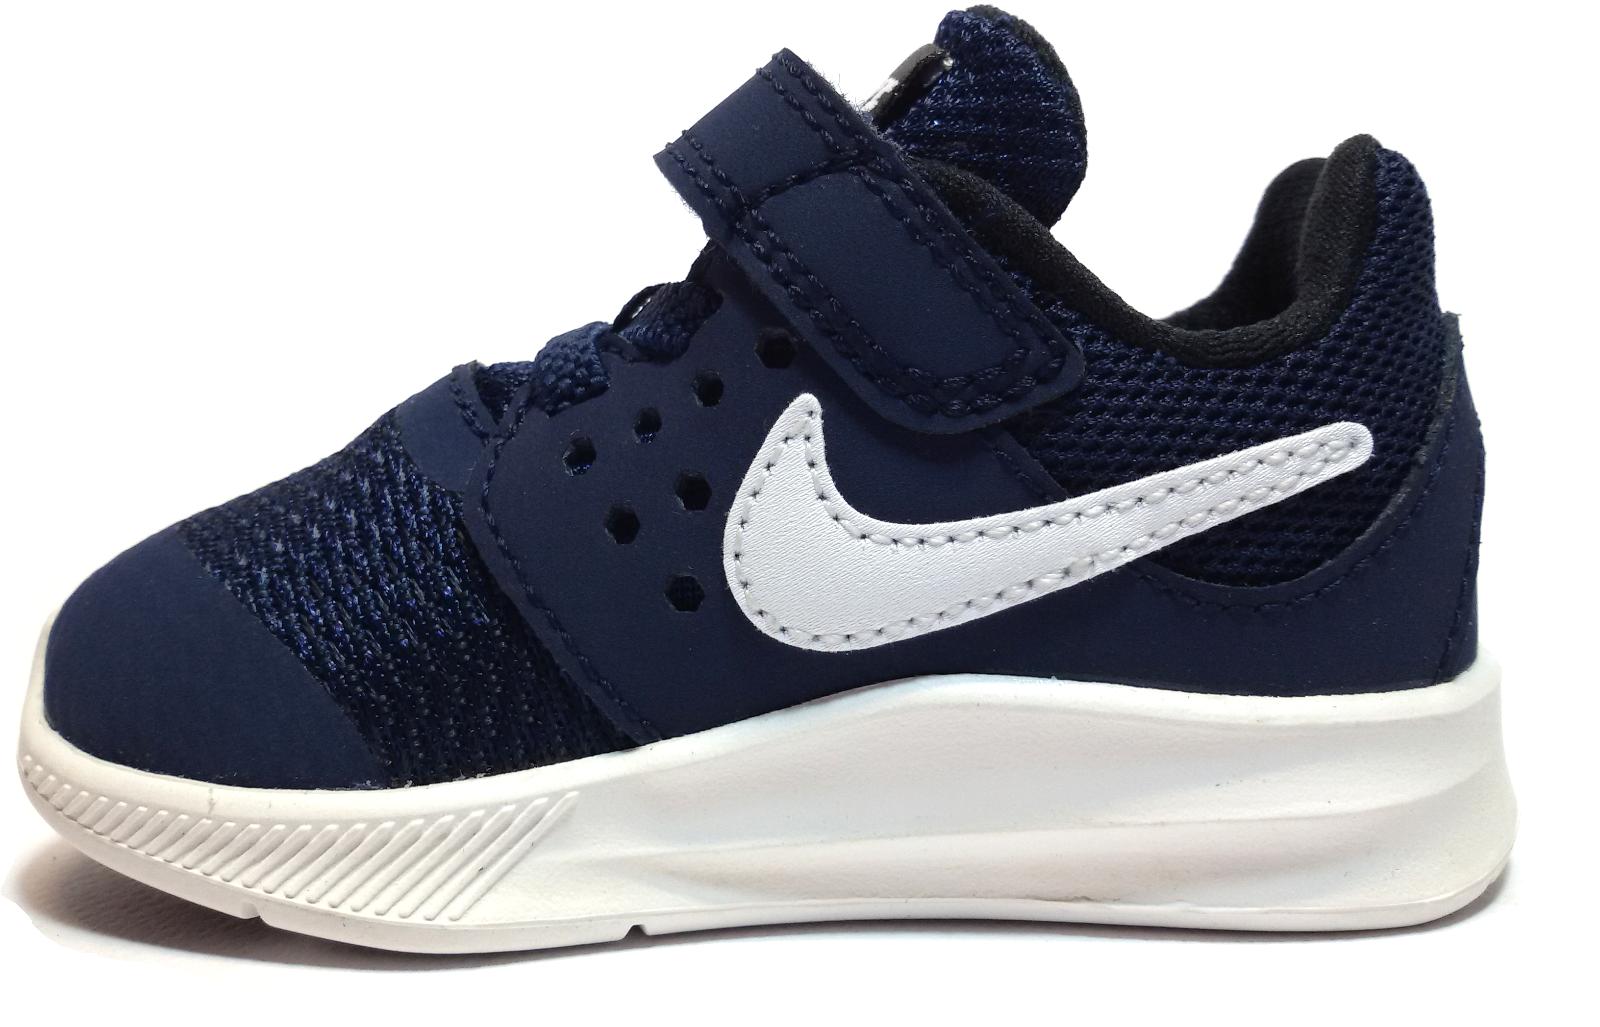 490360717b5 Nike Downshifter 7 (Tdv) Scarpe Bambino Sneakers Blu Ginnastica - 869974  400 3 3 di 6 ...